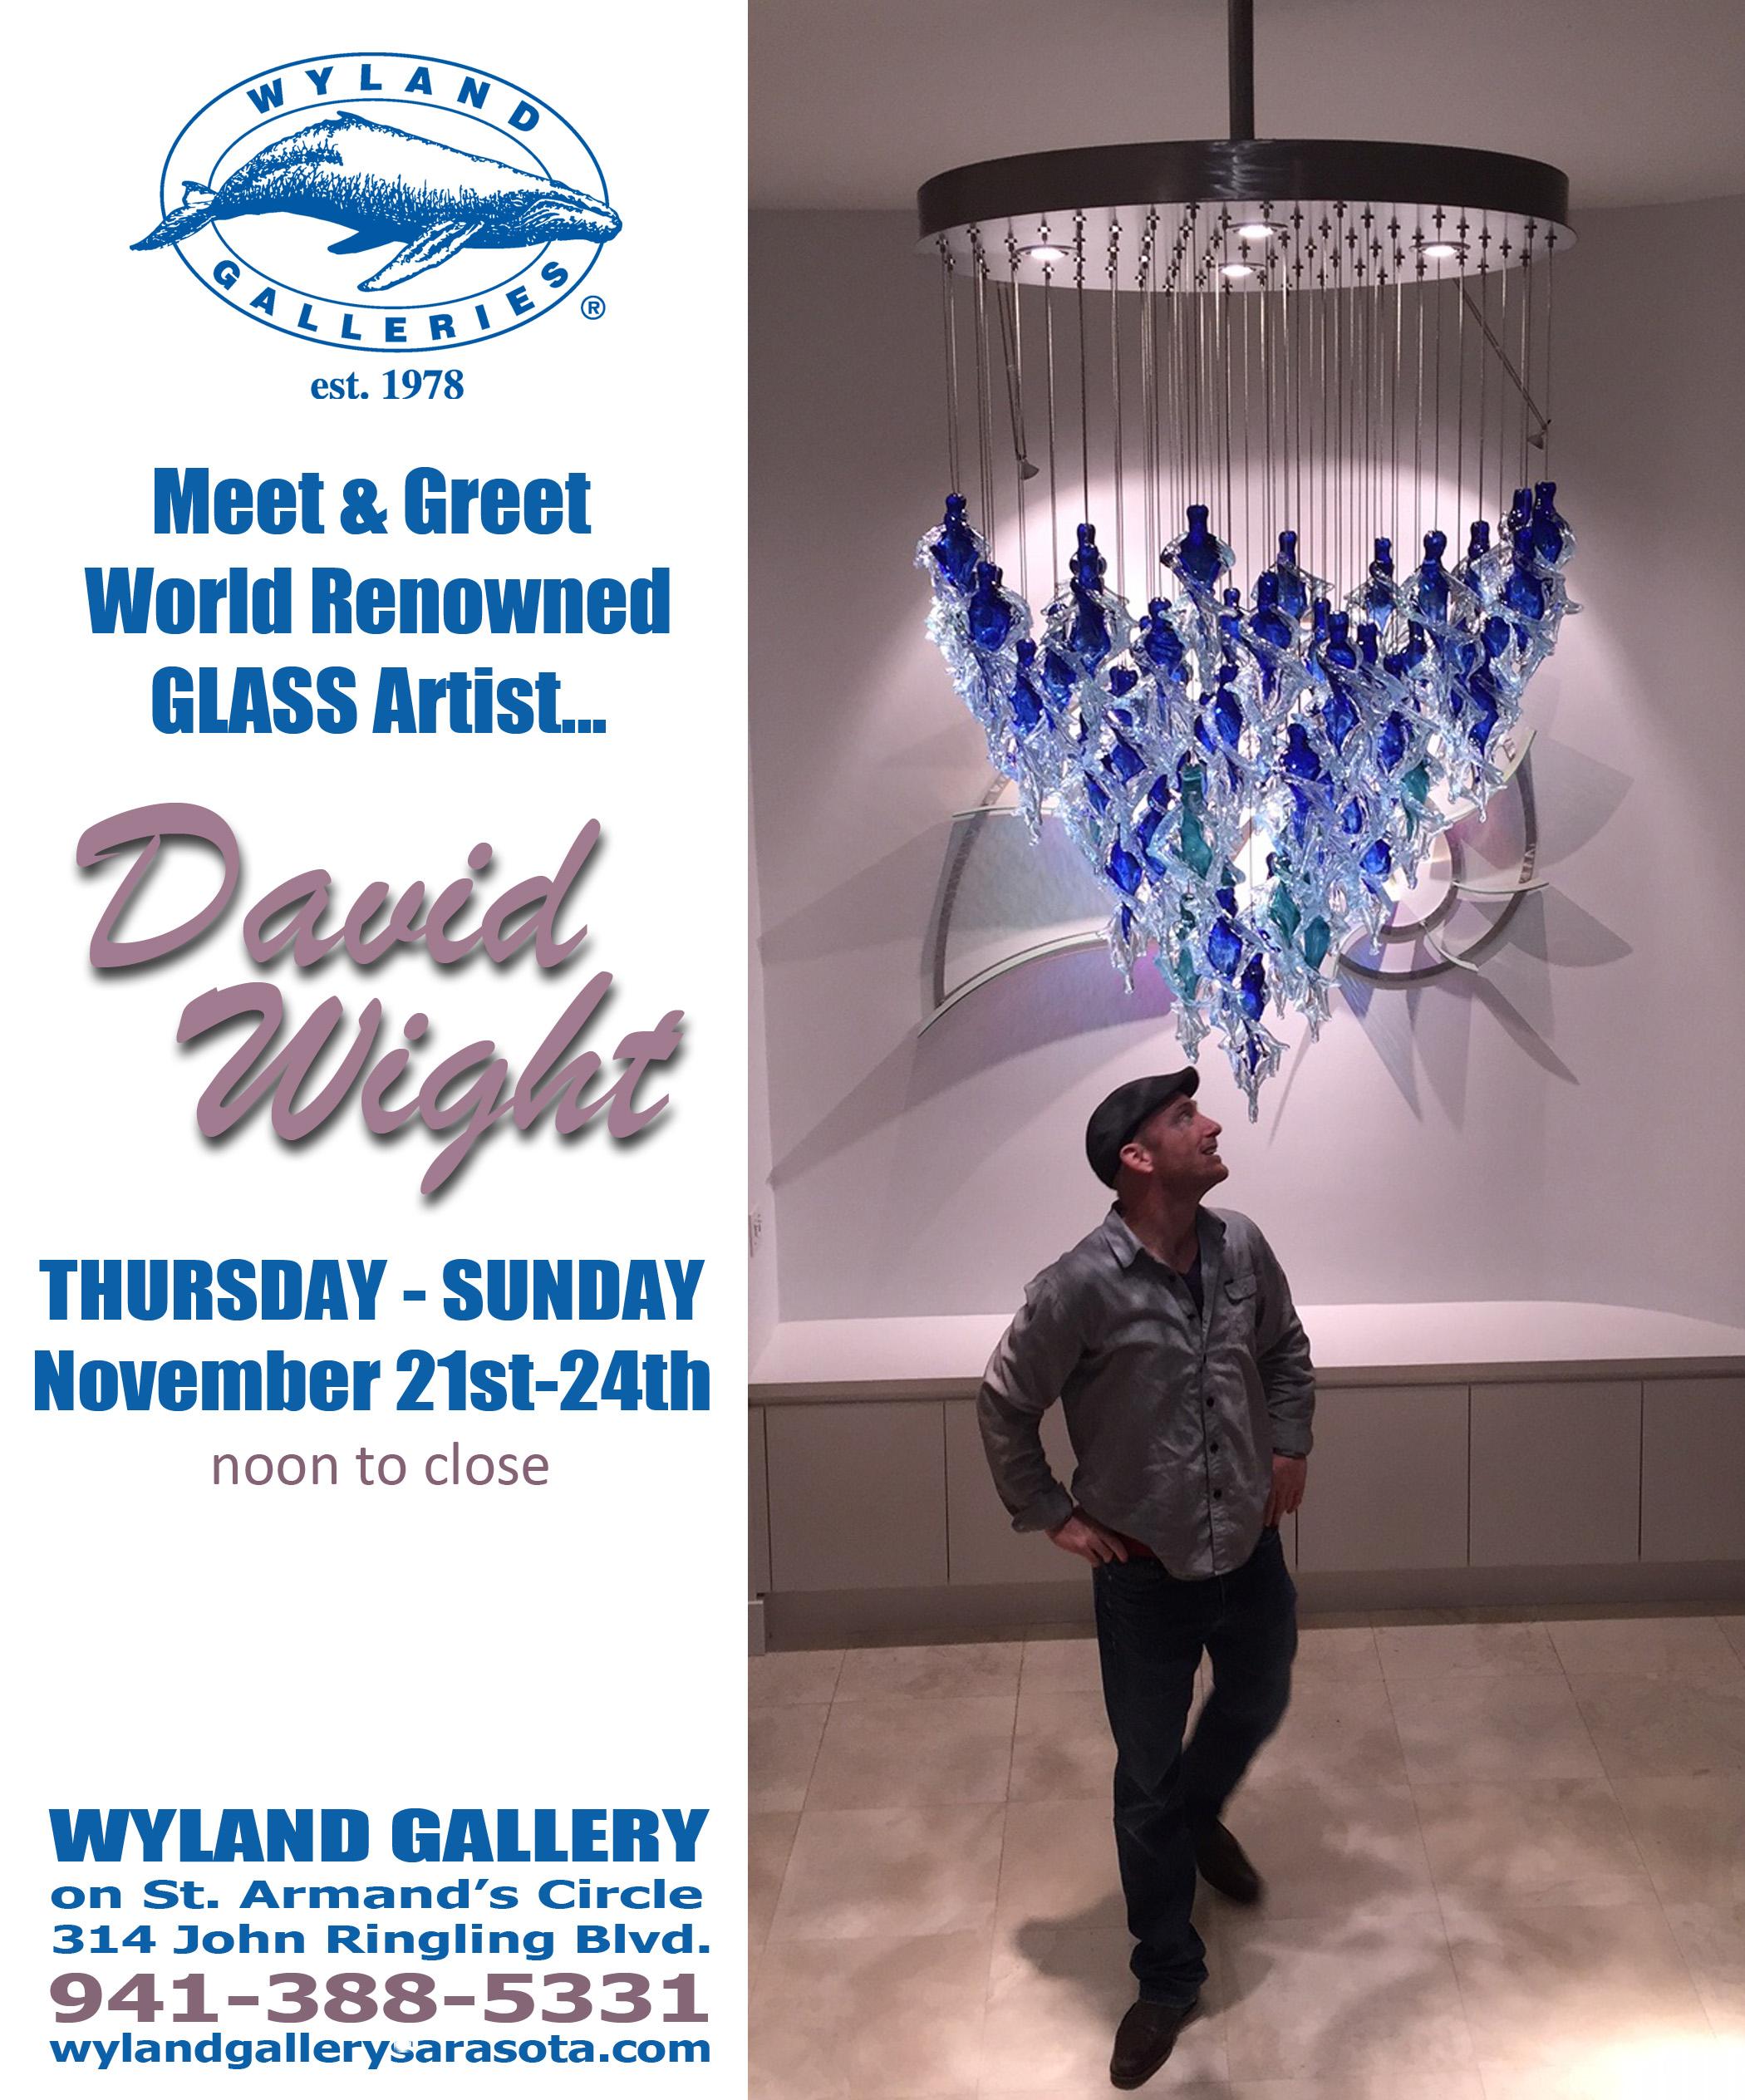 David Wight Glass Art Show at Wyland Gallery Sarasota